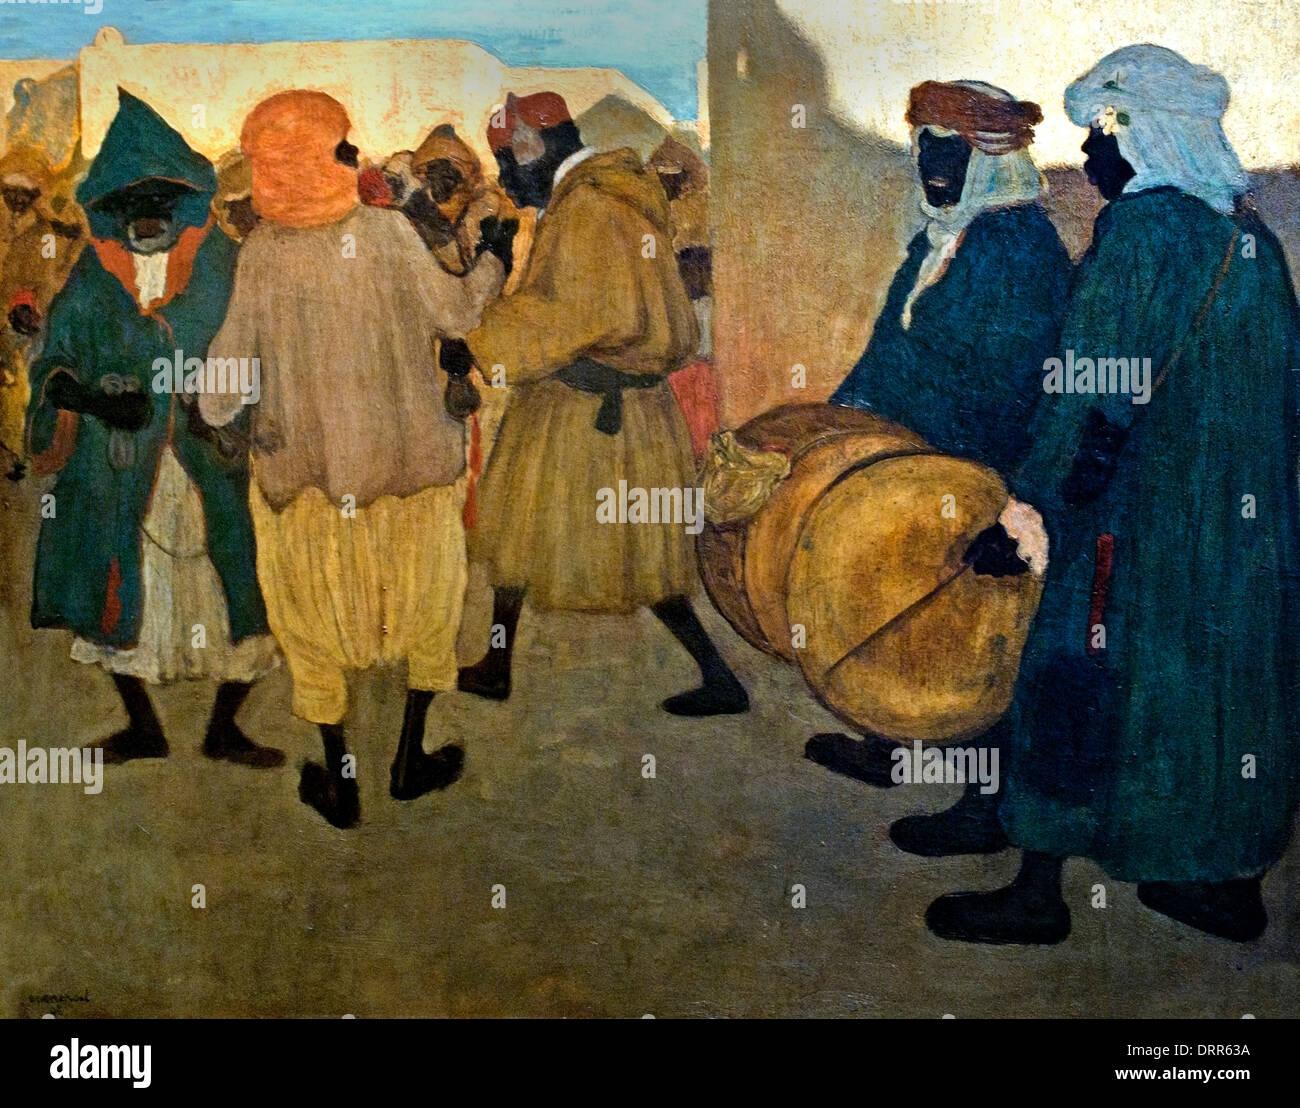 Announcement of the negro Festival Blida Algeria Henri Evenepoel (1872–1899)   Blidah 1898  Belgian Belgium - Stock Image